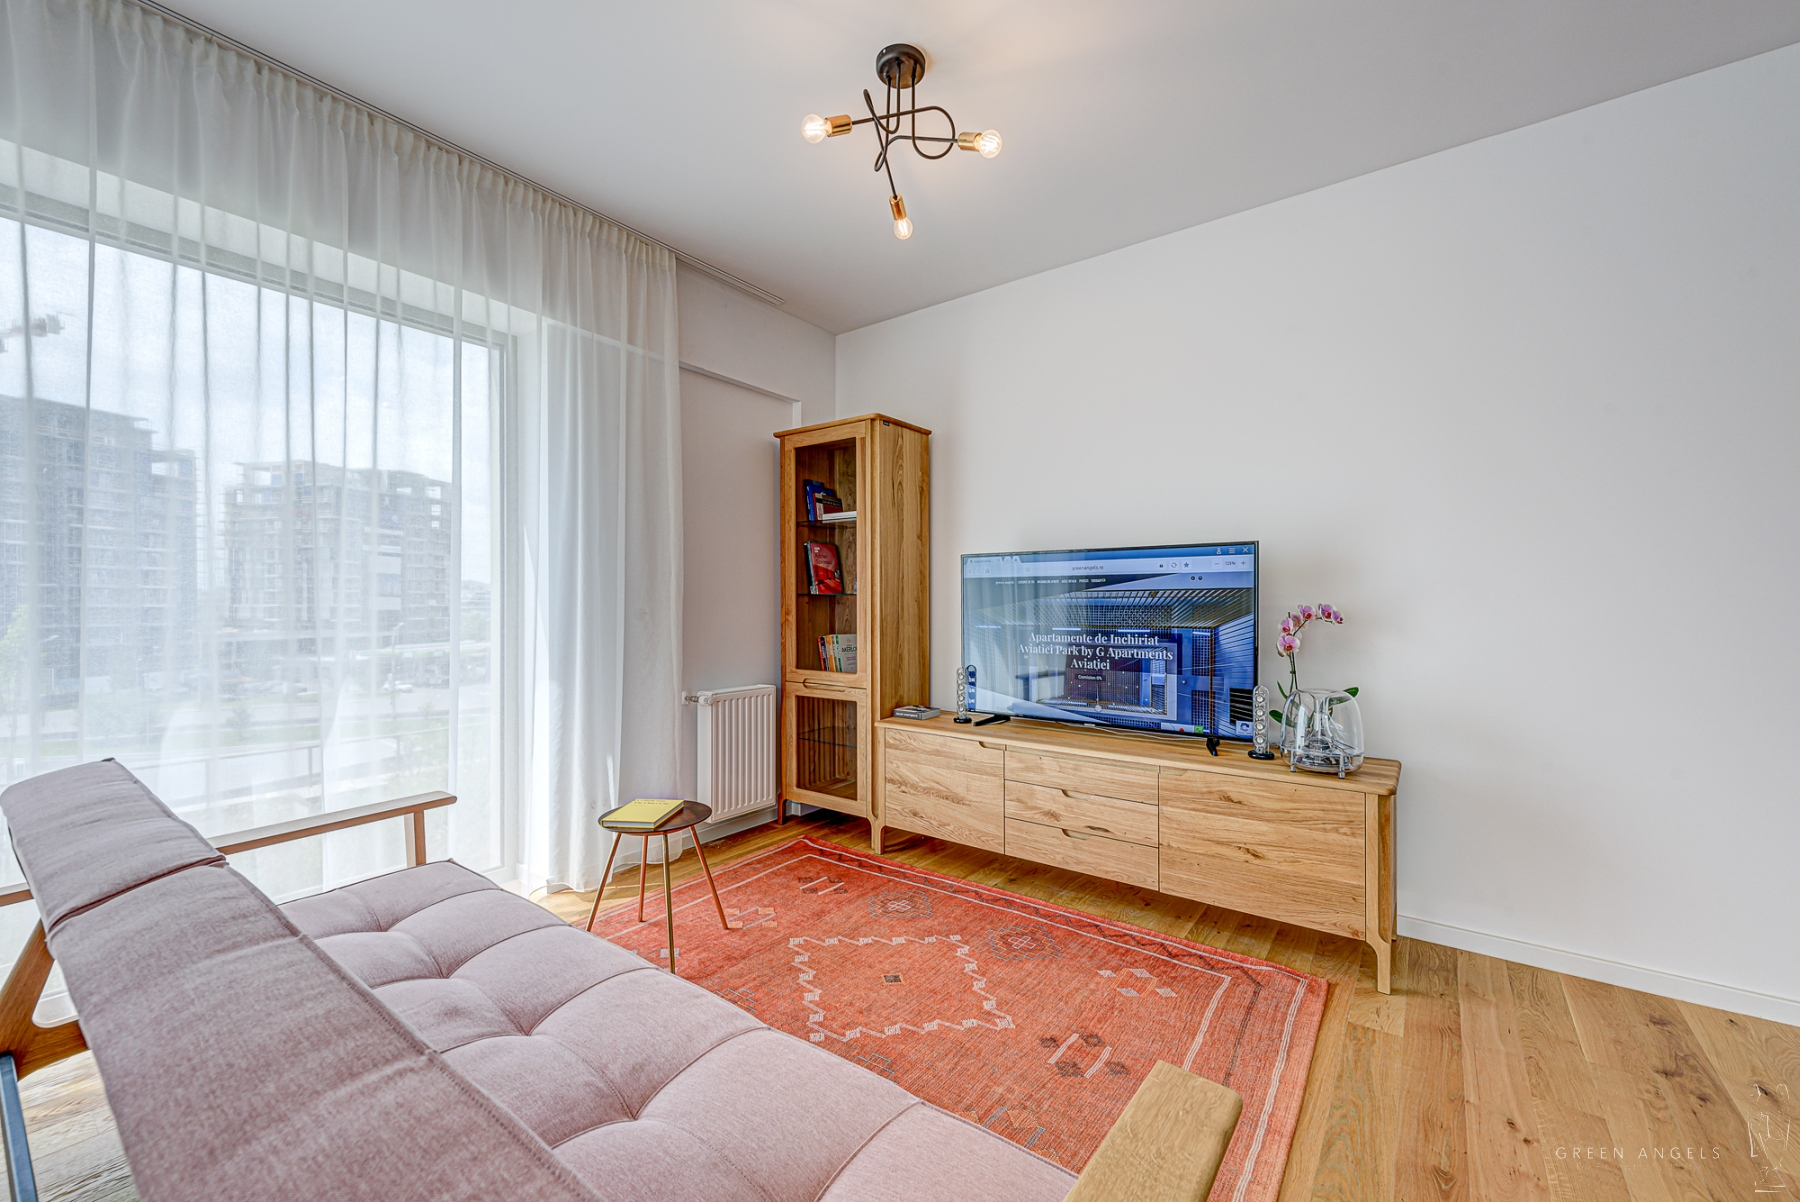 Apartament cu 3 camere de inchiriat in Aviatiei Park